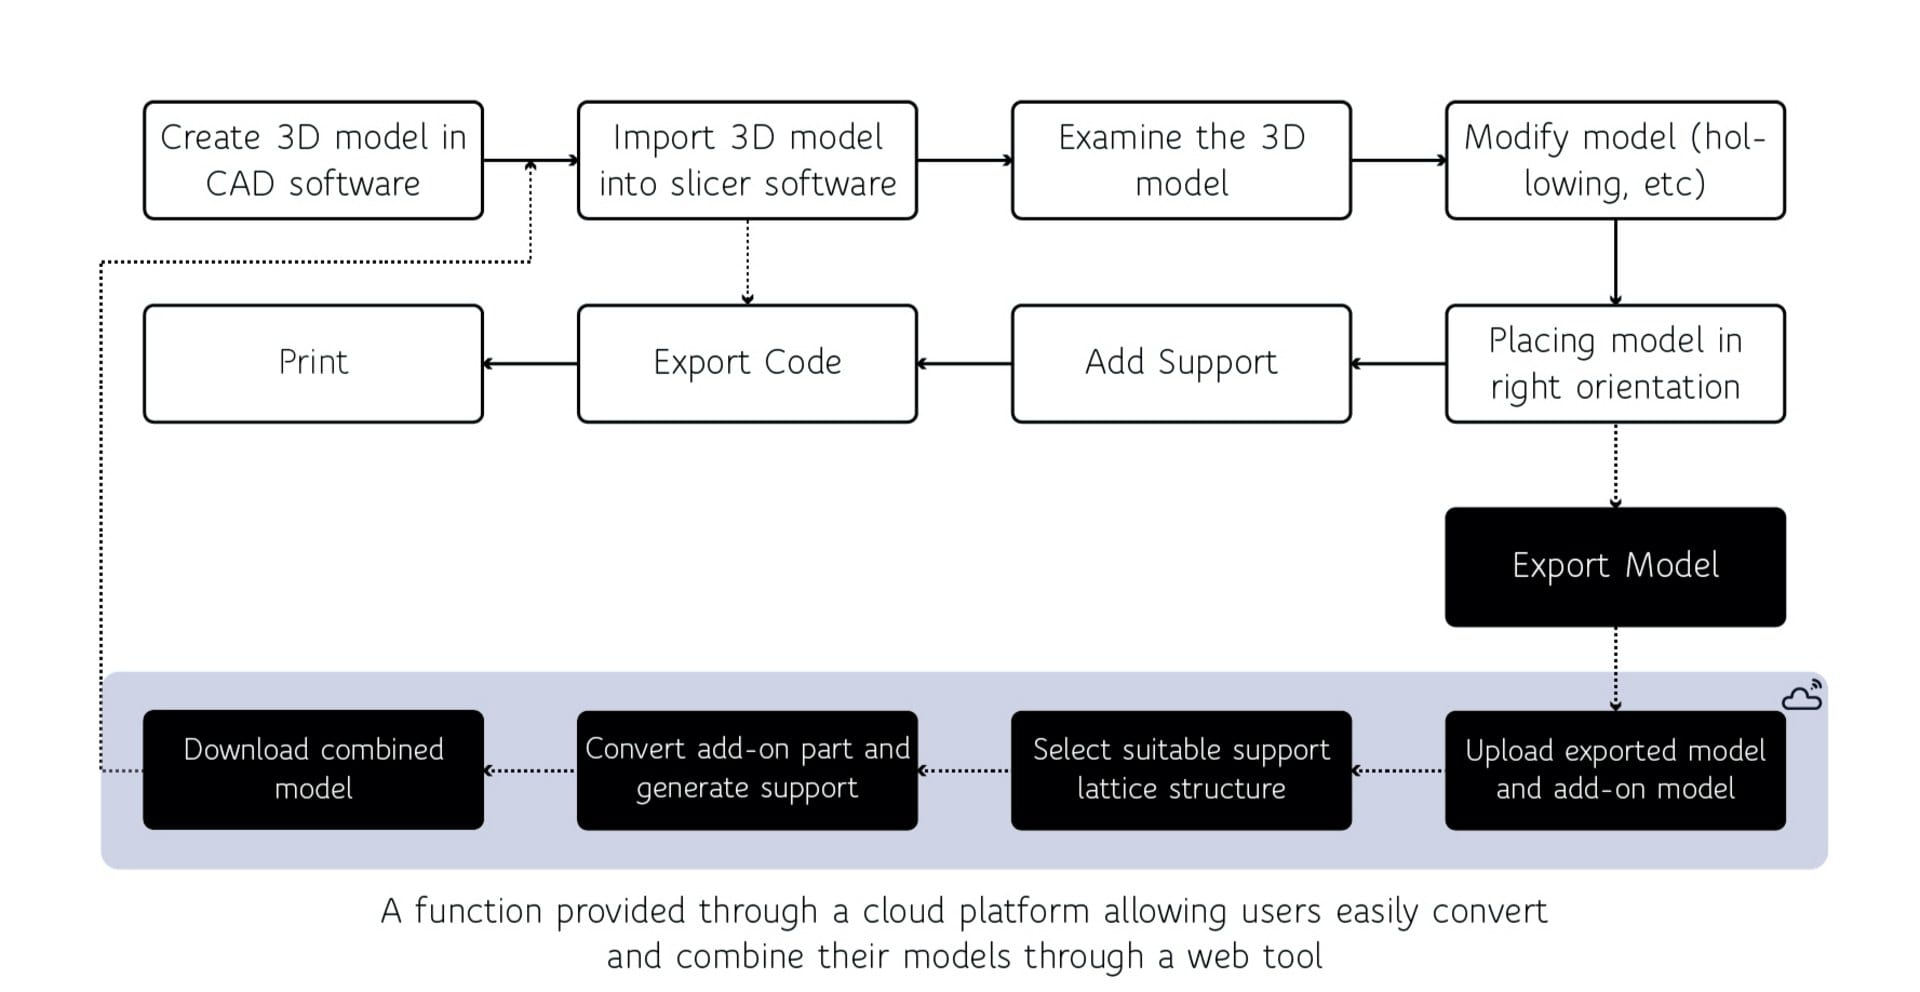 Process of using this platform